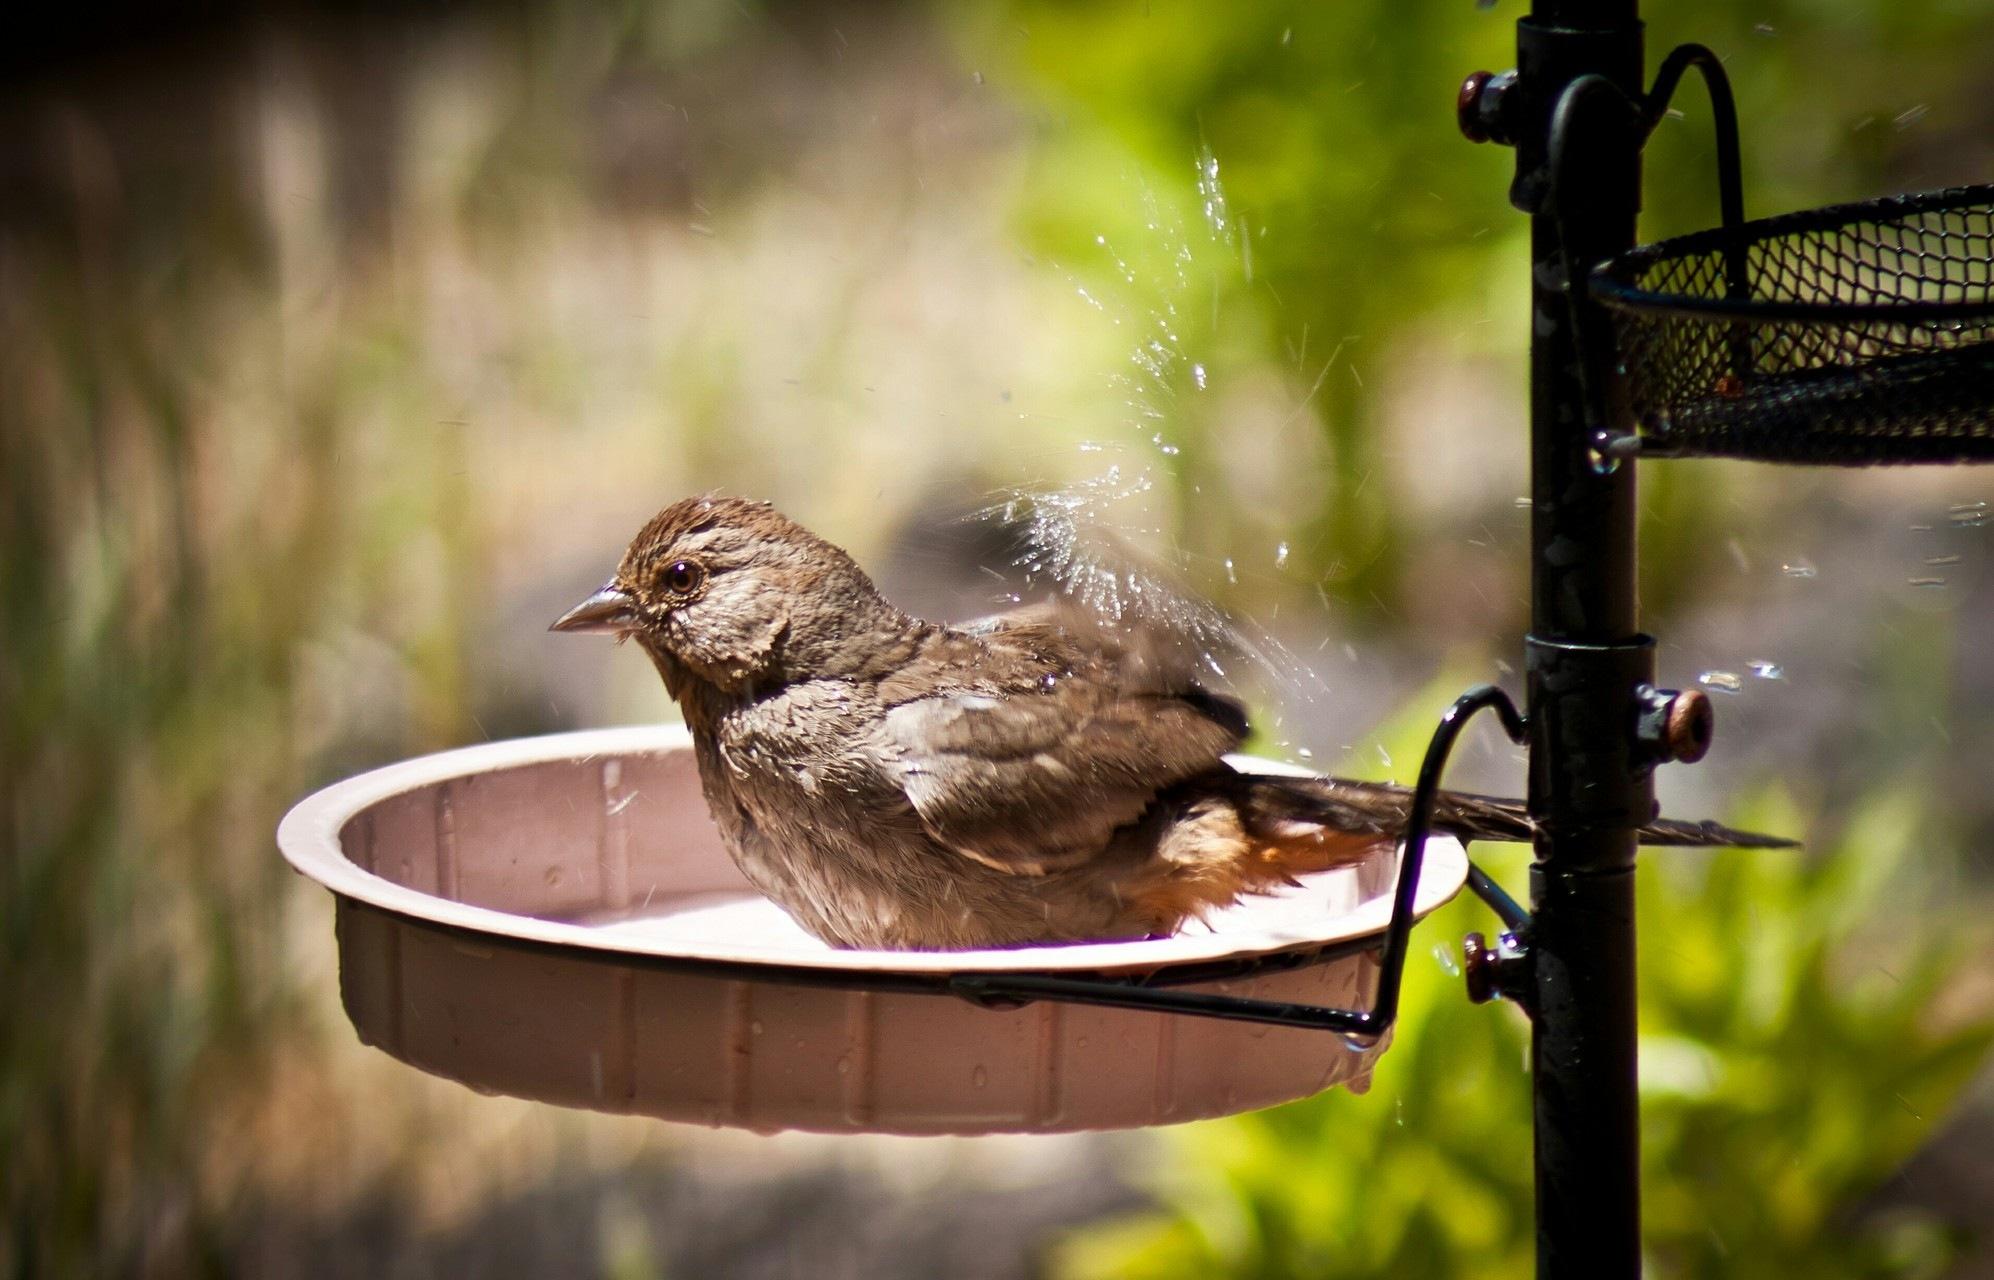 Birds Bath by Divyesh Parate